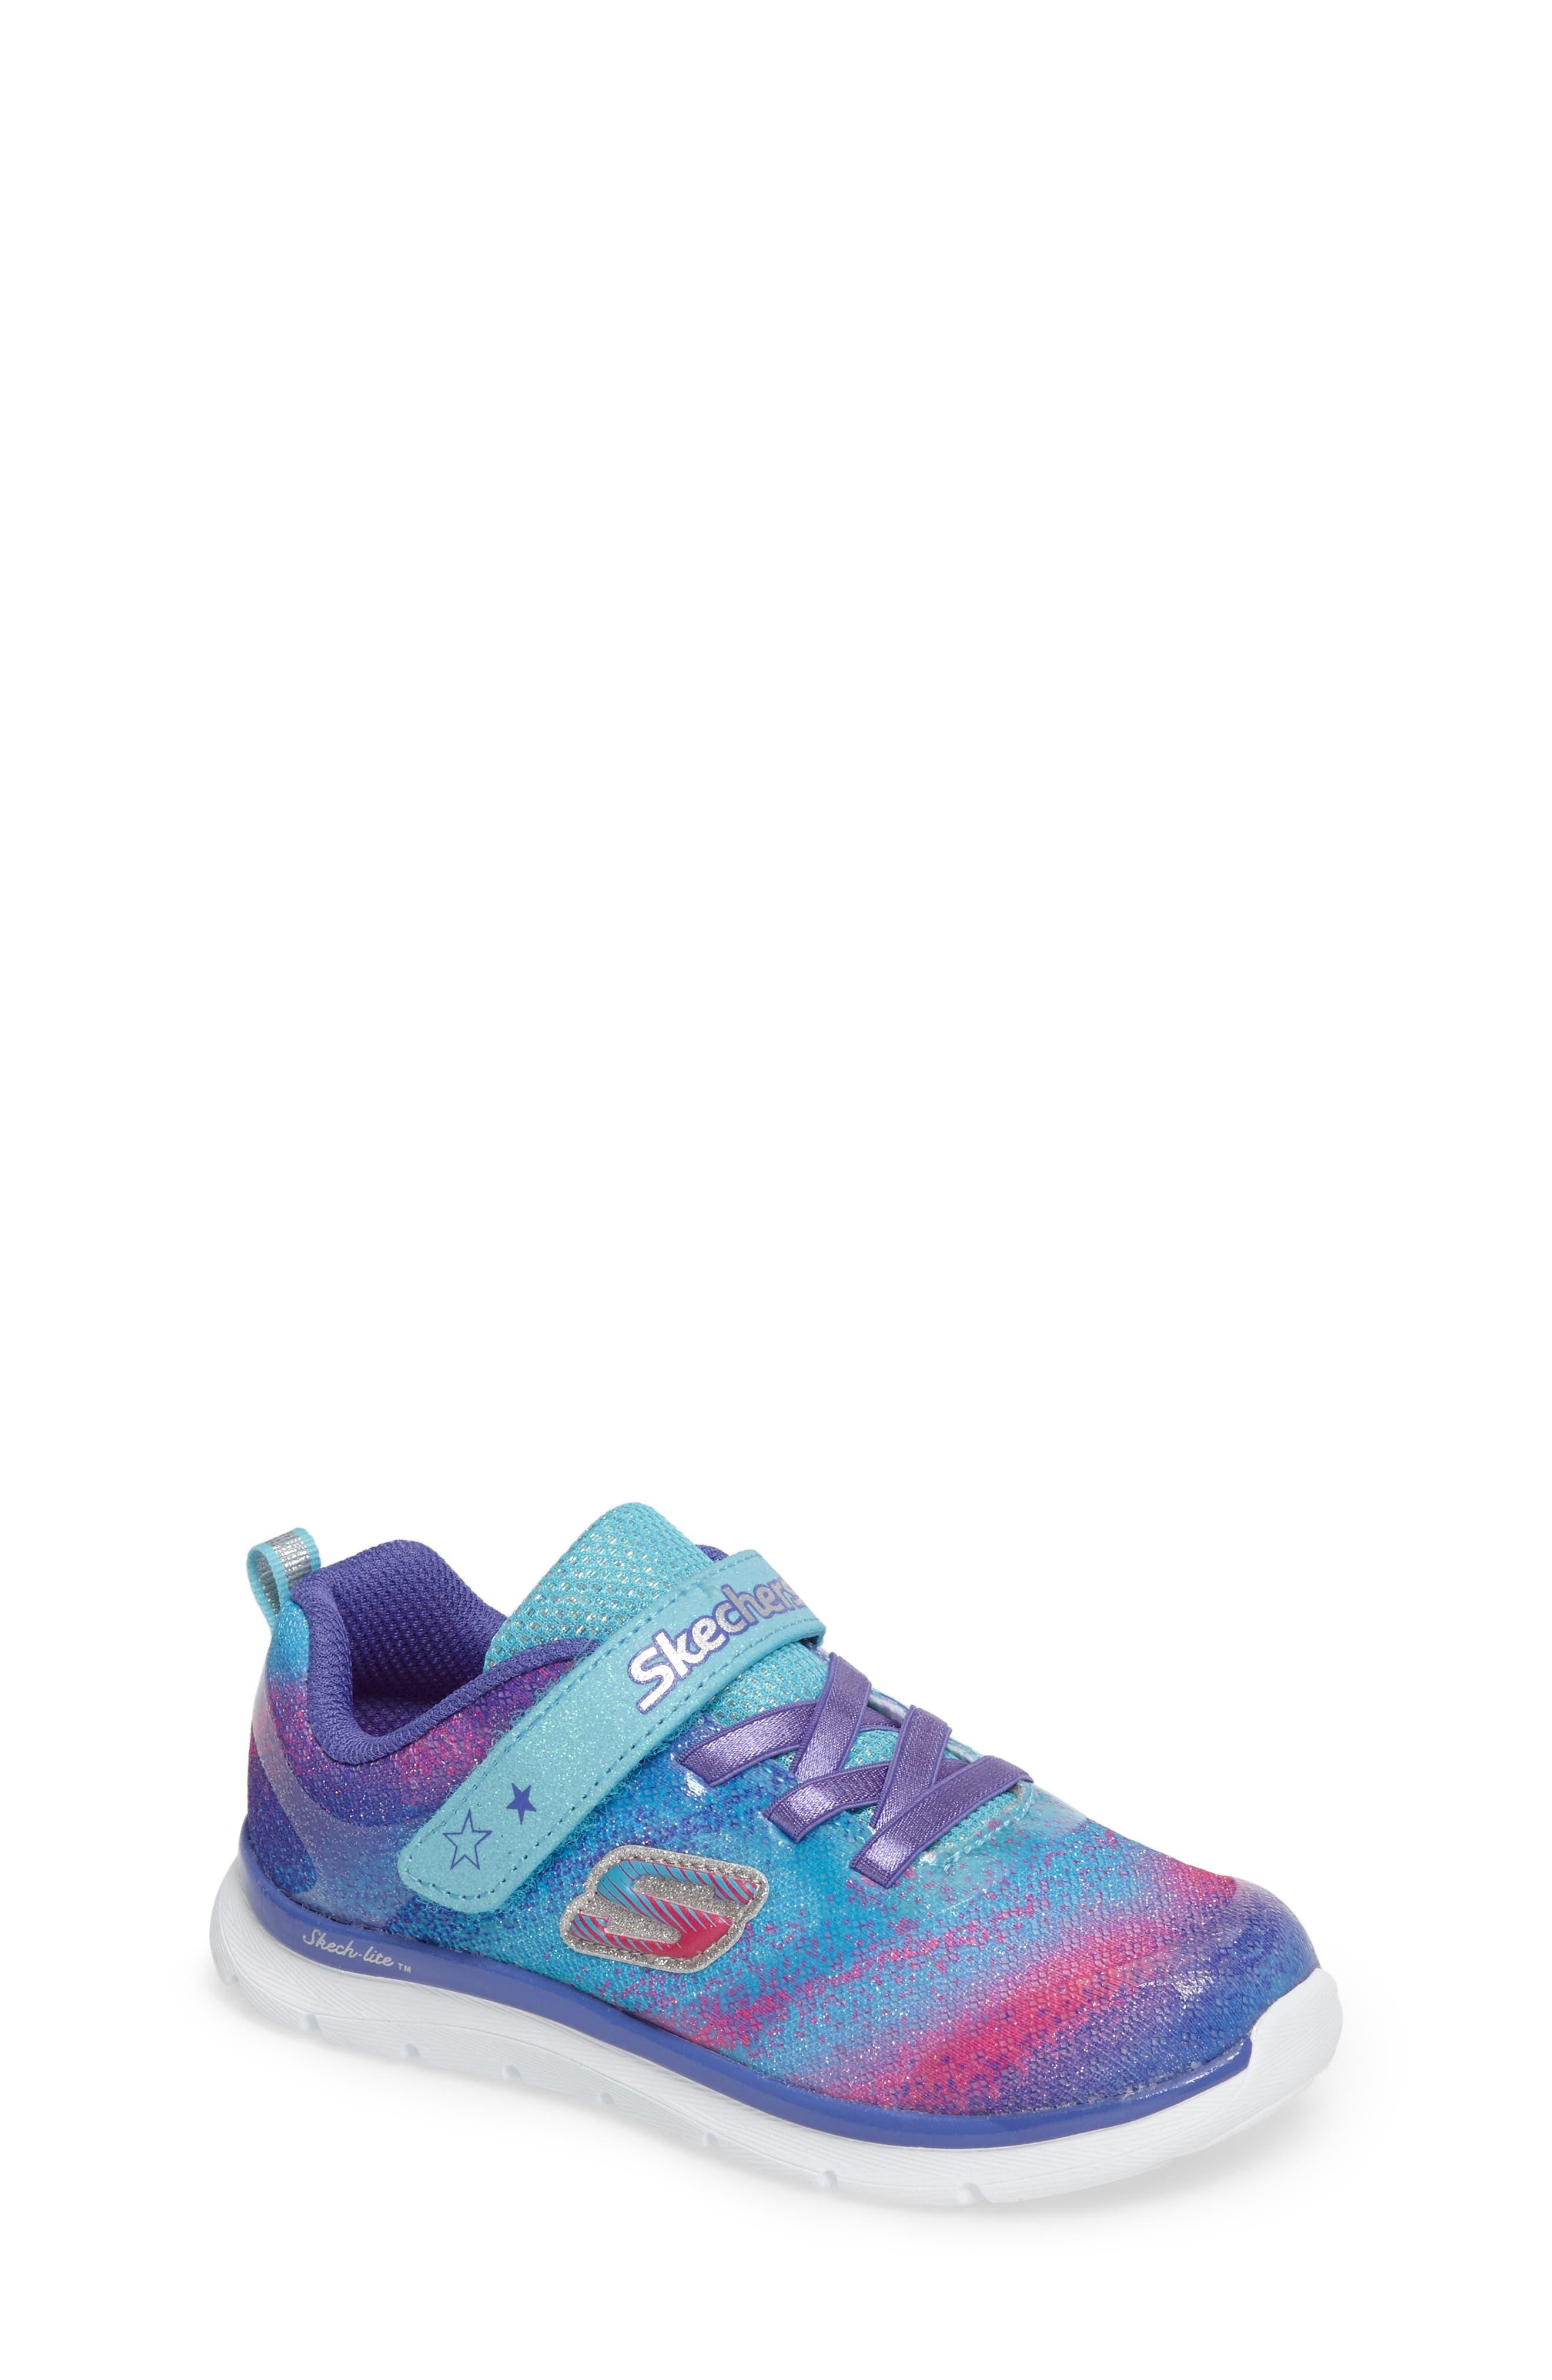 Skech-Lite Colorful Cutie Sneaker,                         Main,                         color, 400